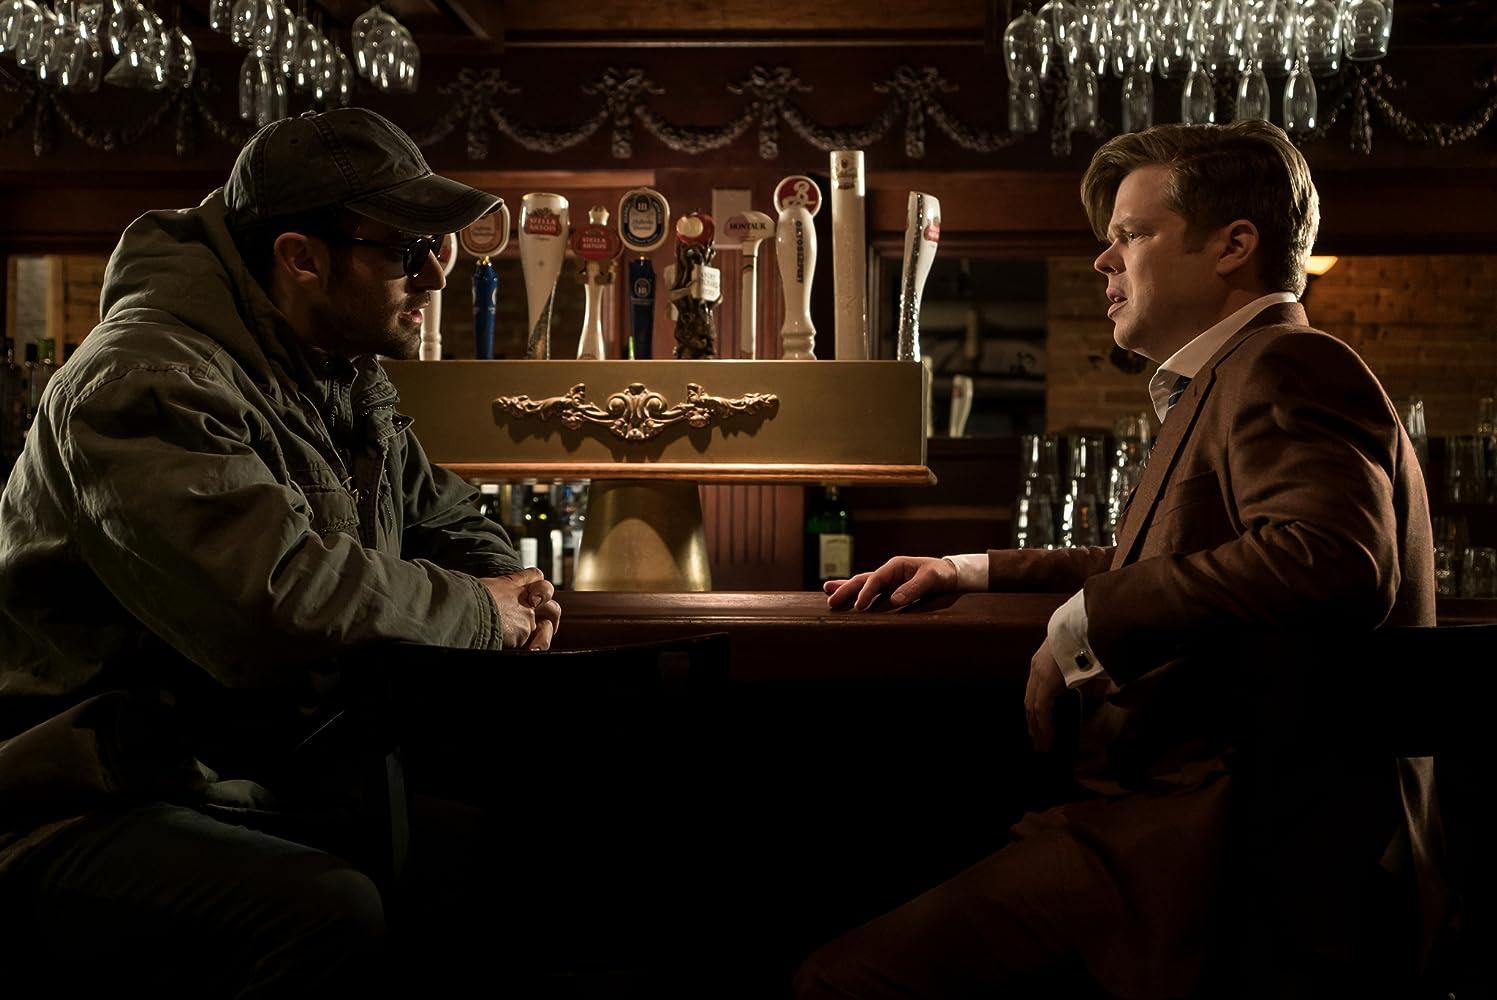 Elden Henson and Charlie Cox in Daredevil (2015)